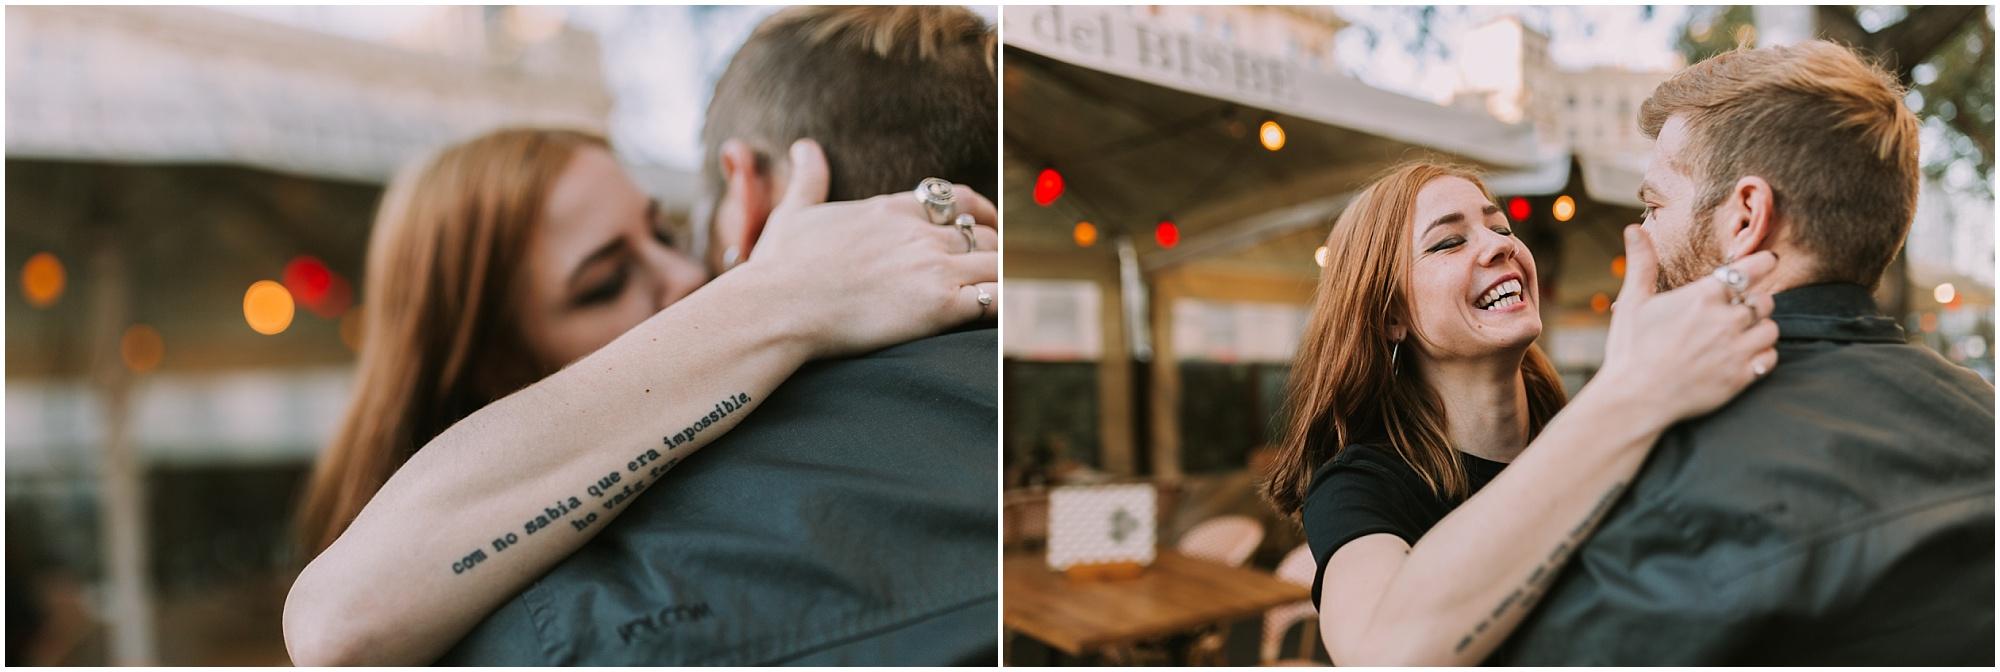 Kateryna-photos-photographer-mariage-boda-love-story-engagement-barcelona_0008.jpg